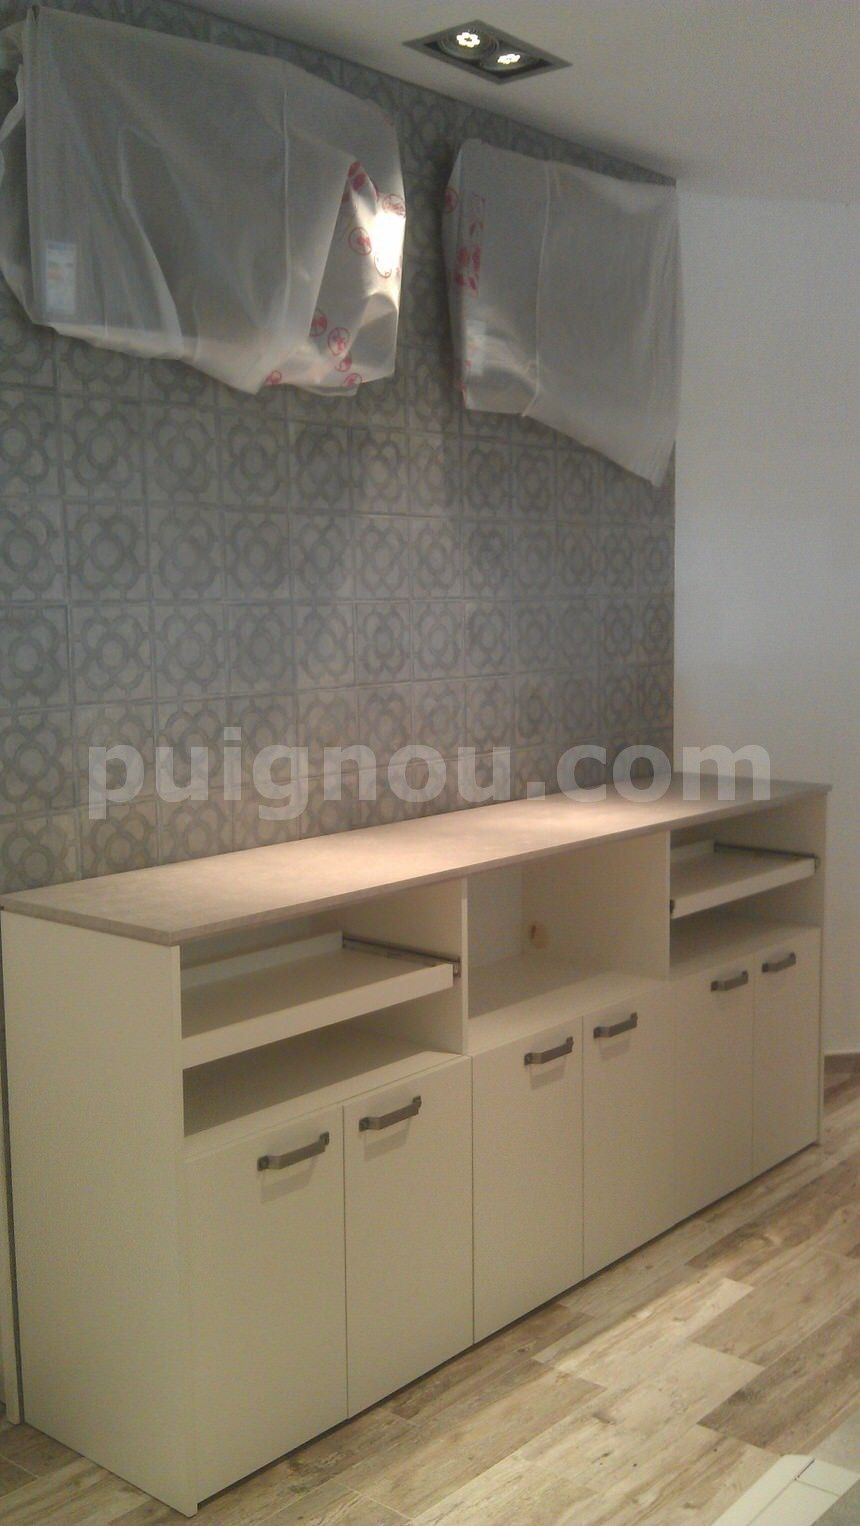 Puignou puigpelatvestidors de madera a medida puignou - Muebles de madera a medida ...